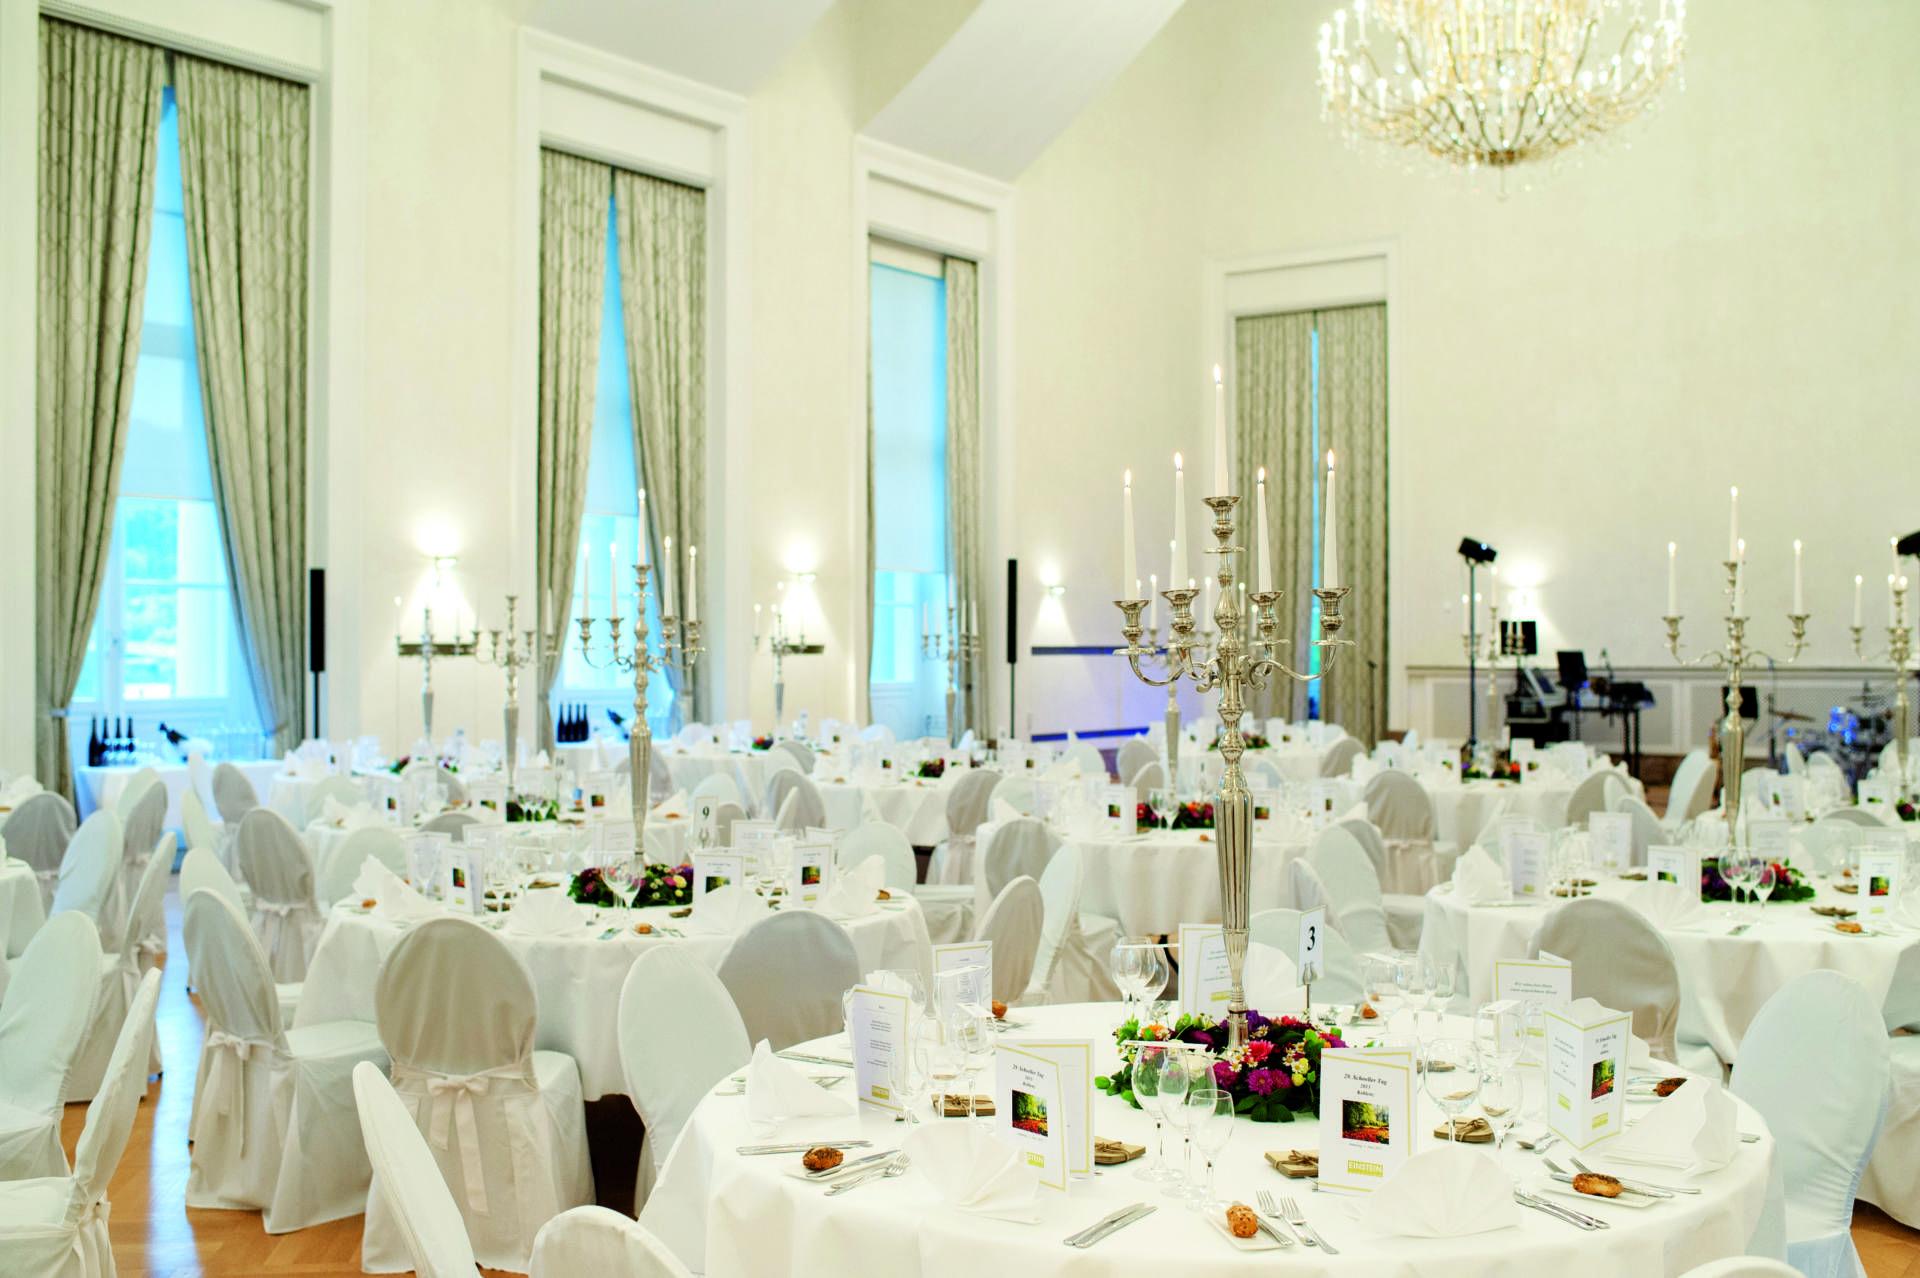 Hochzeit Stiftskirche St Peter – Schloss Hellbrunn Romantik Hotel Die Gersberg Alm in Salzburg